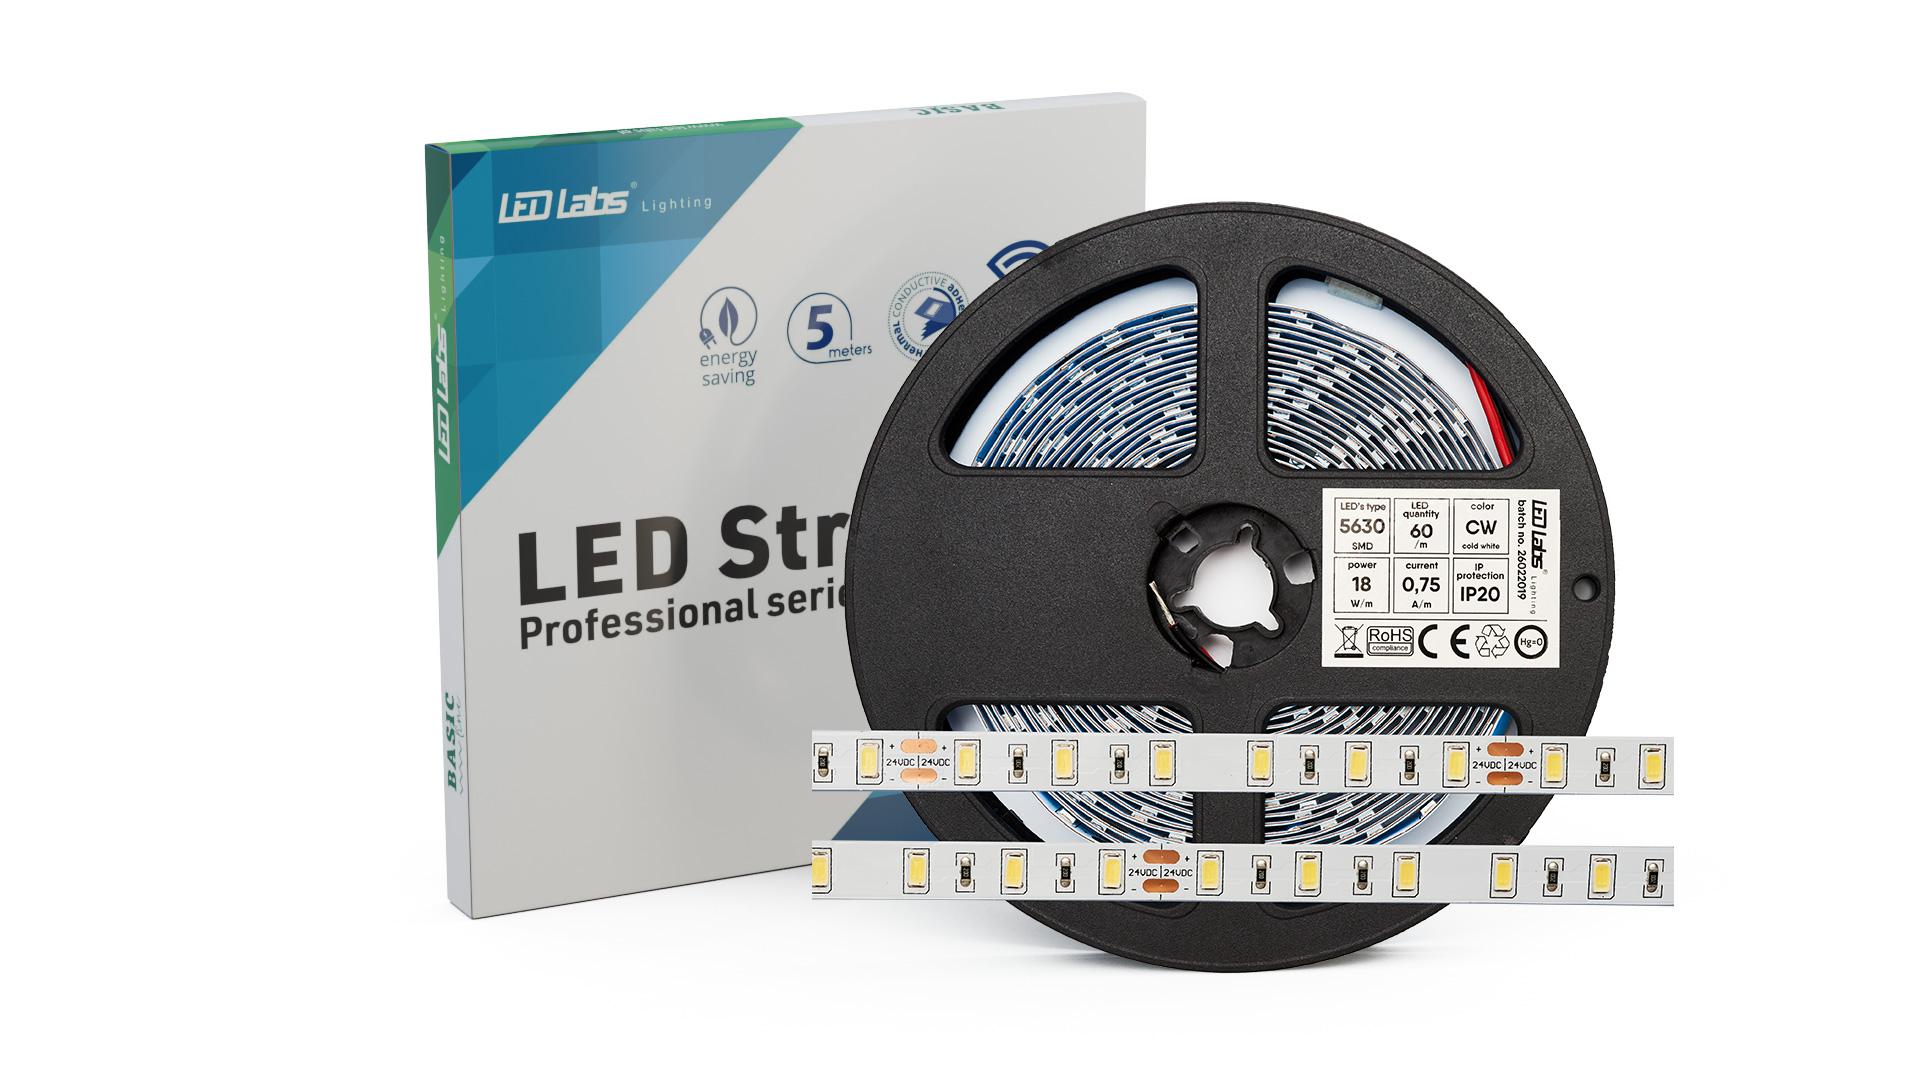 Taśma PRO 3YB 24V 300 LED 5630 SMD 16W CW